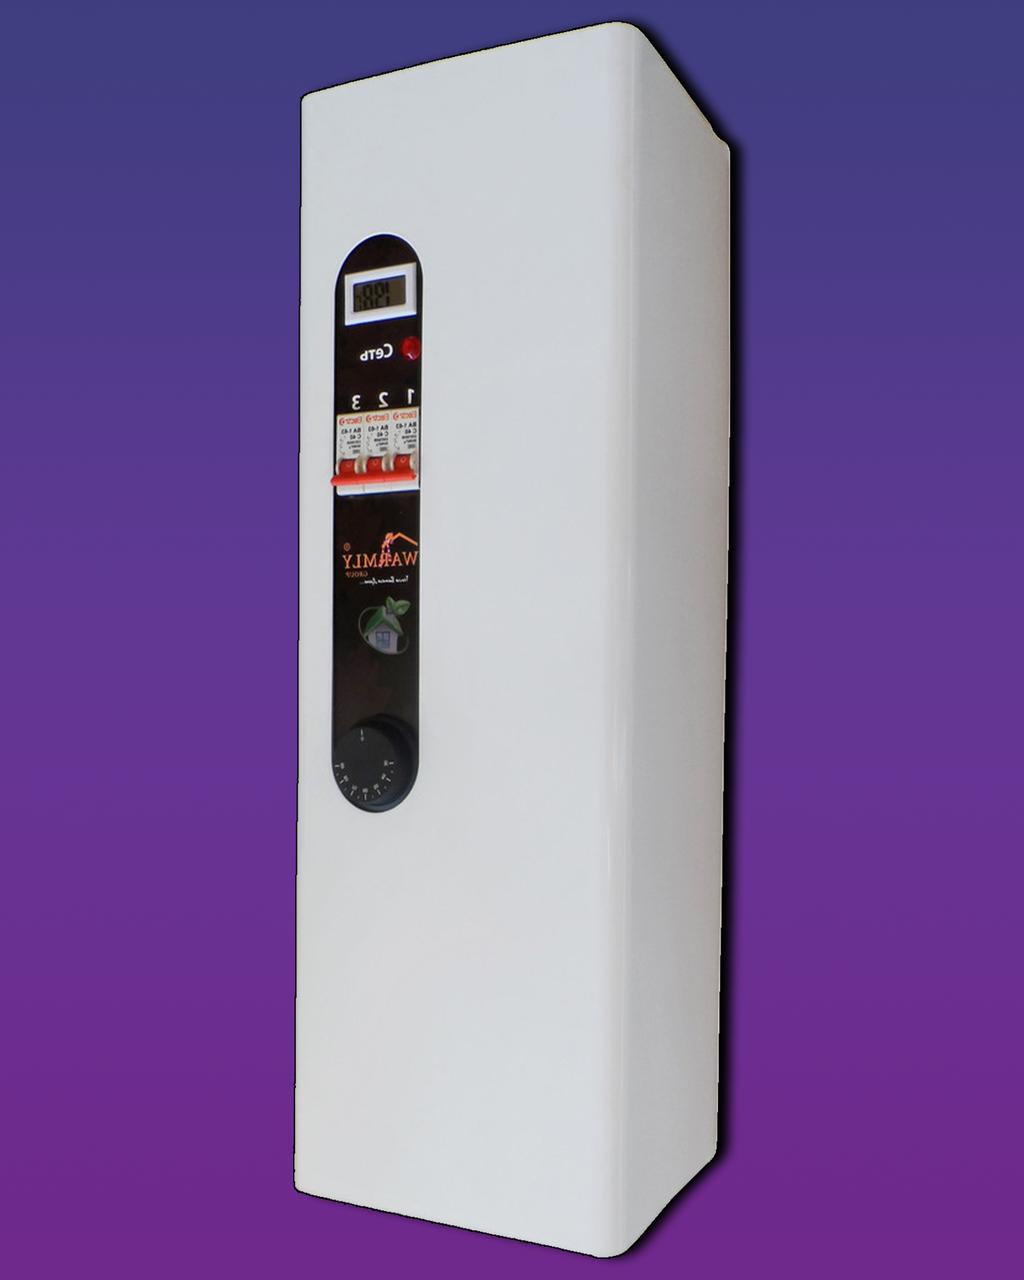 Електричний котел з насосом WARMLY CLASSIK-MG 3 кВт 220 В